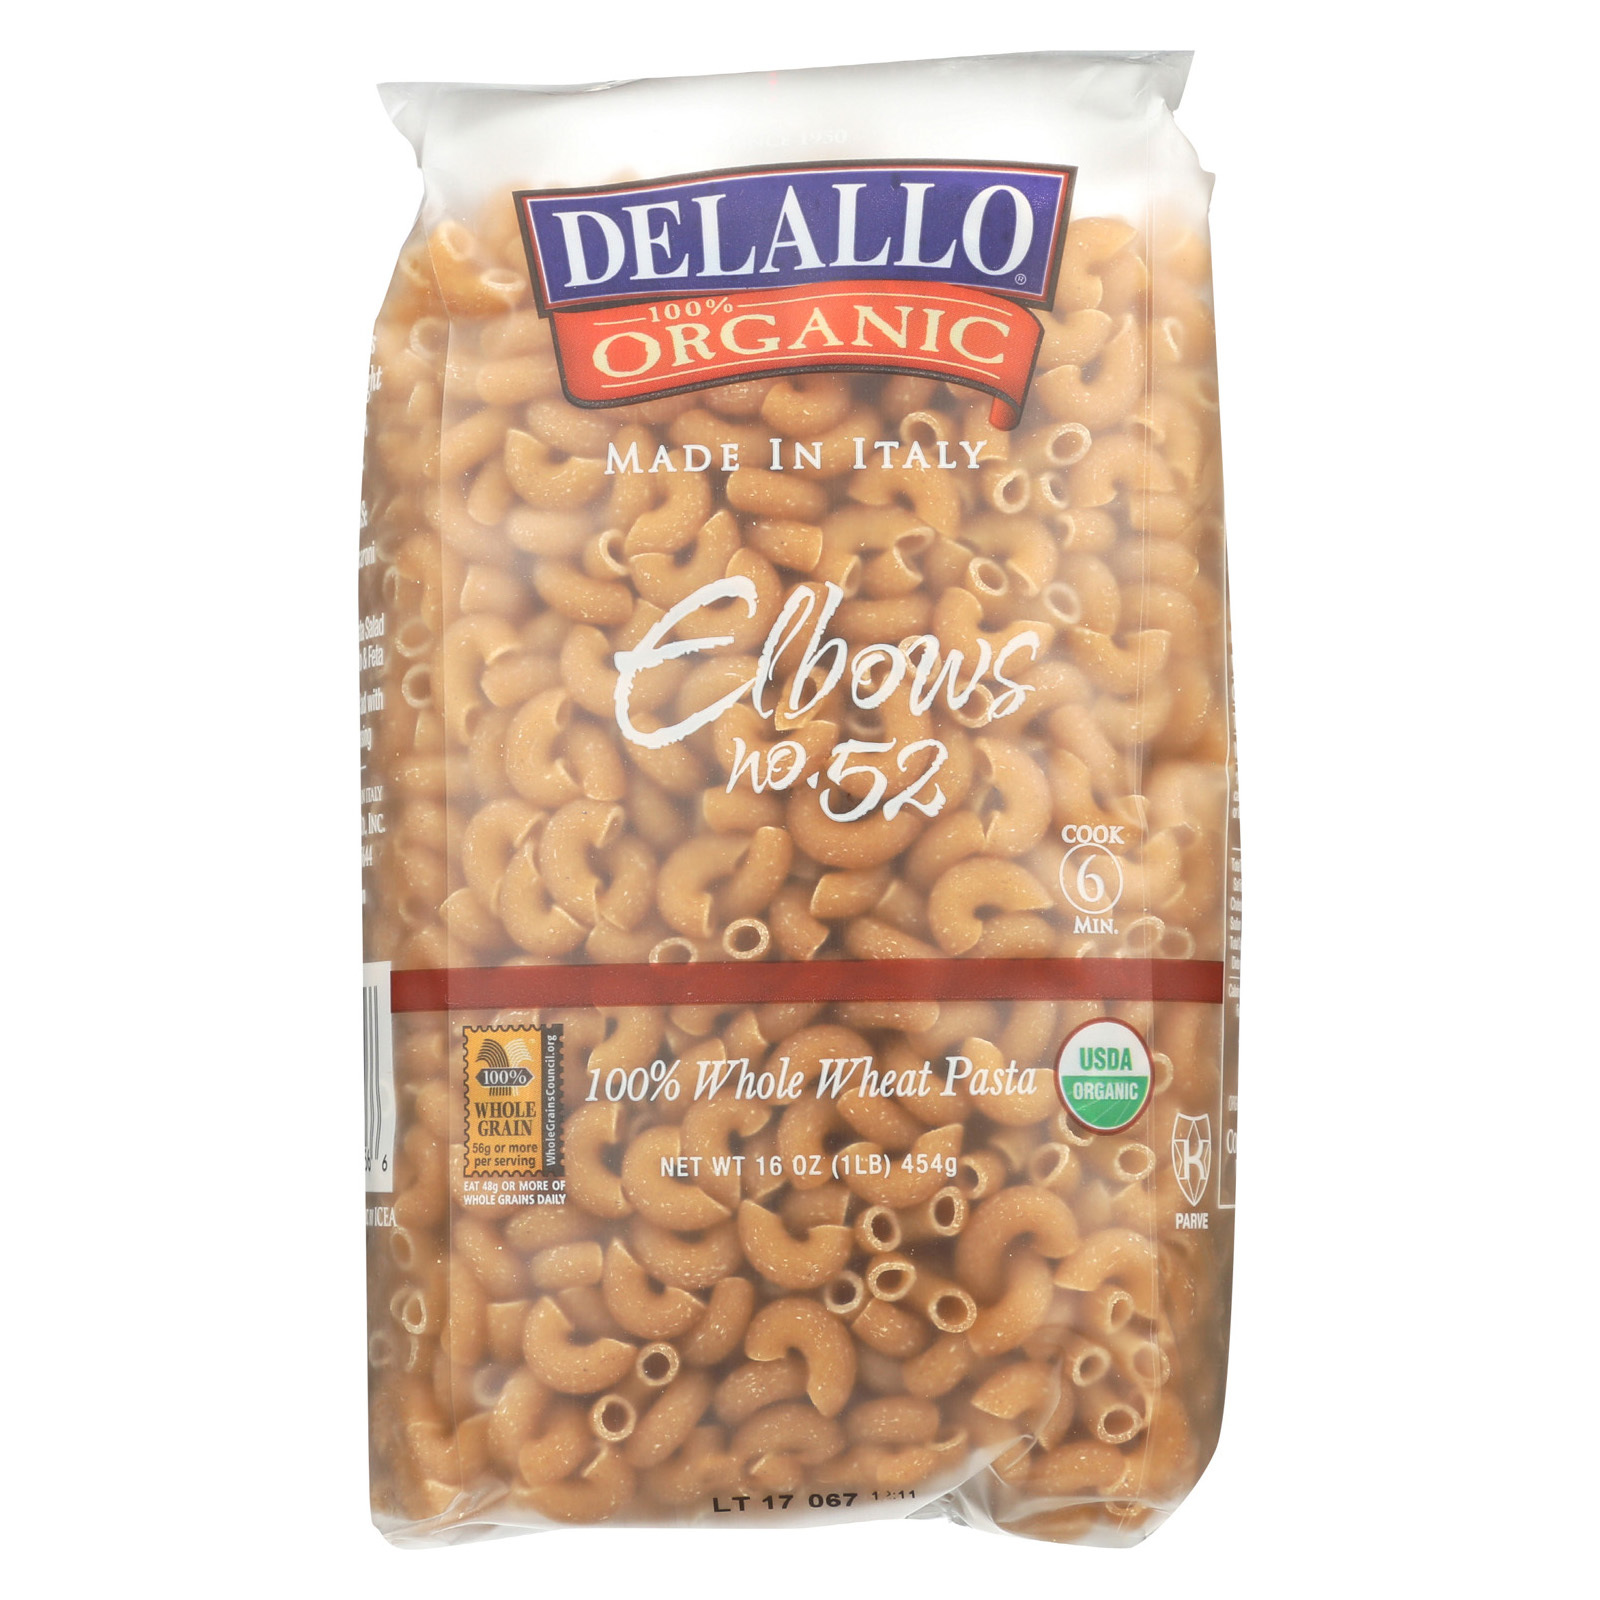 Delallo 100% Organic Whole Wheat #52 Elbows - Case of 16 - 1 lb.